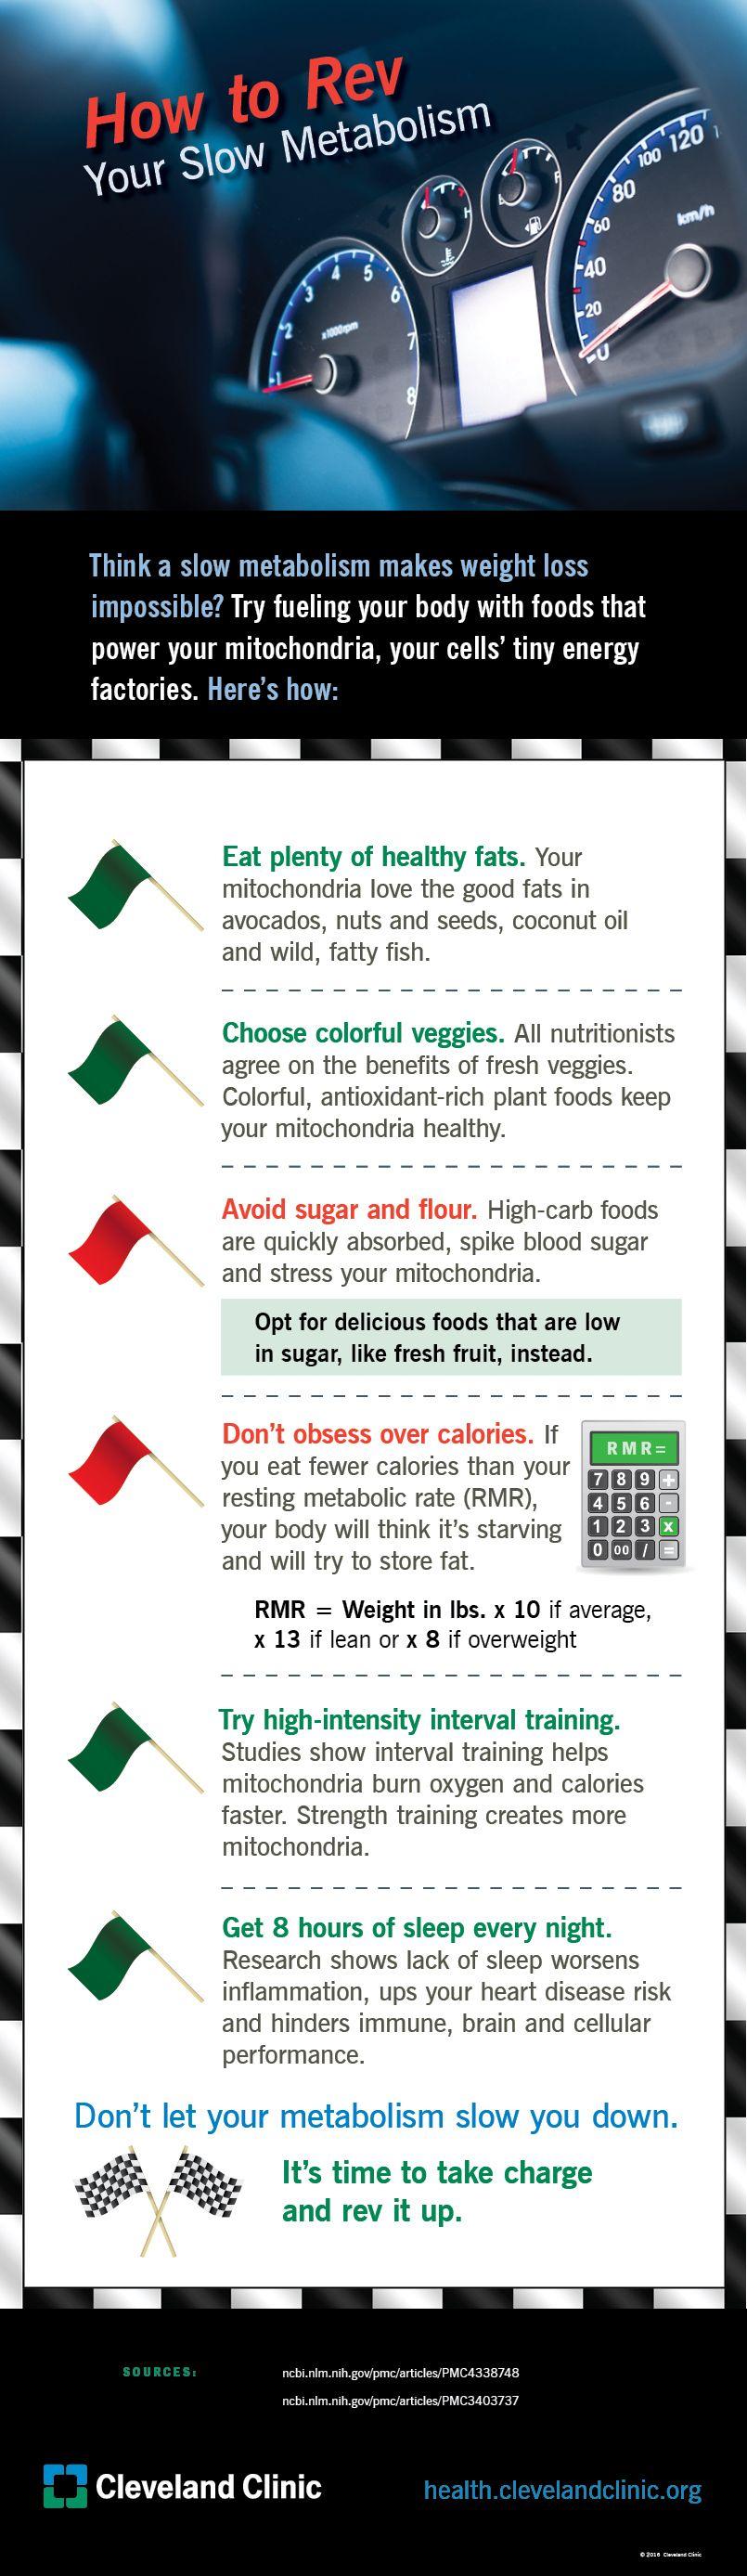 6 Ways To Fix Your Slow Metabolism